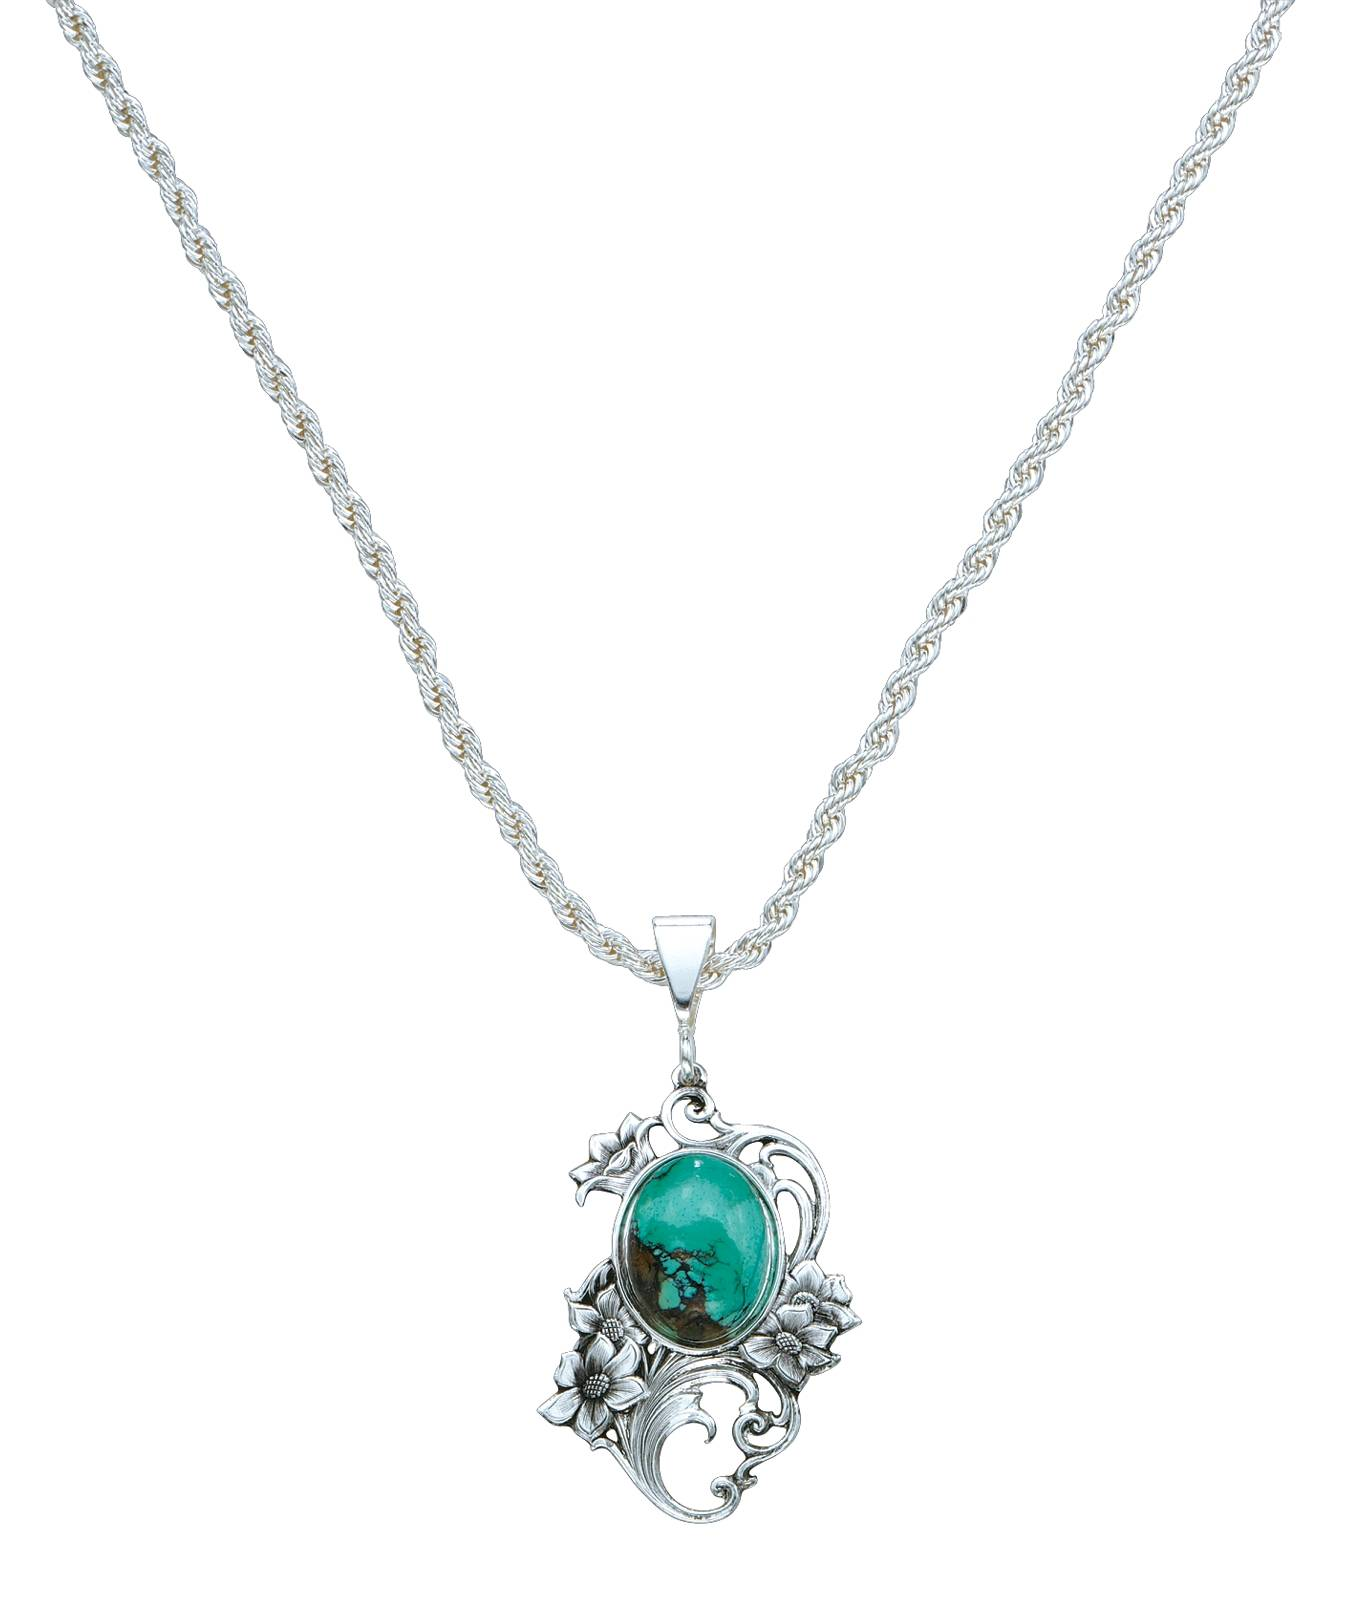 Montana Silversmiths Blue Earth Posie Necklace